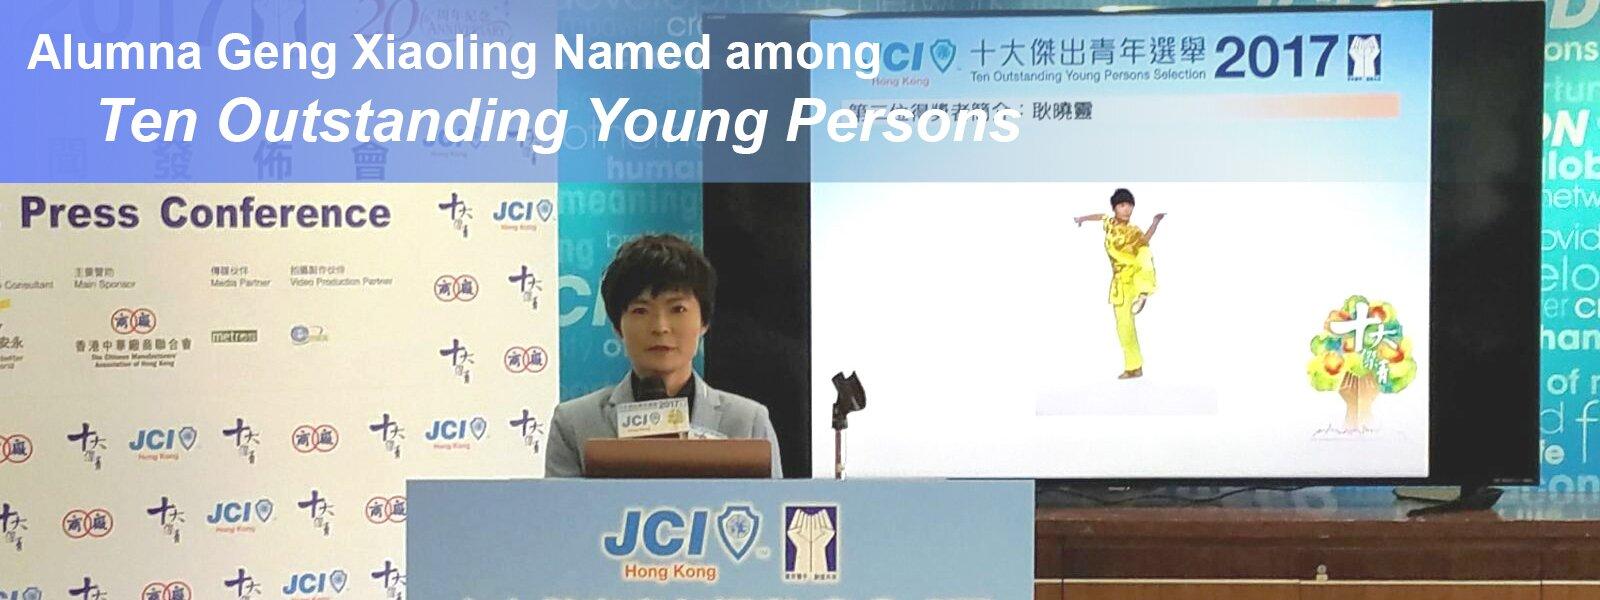 Alumna Geng Xiaoling Named among Ten Outstanding Young Persons